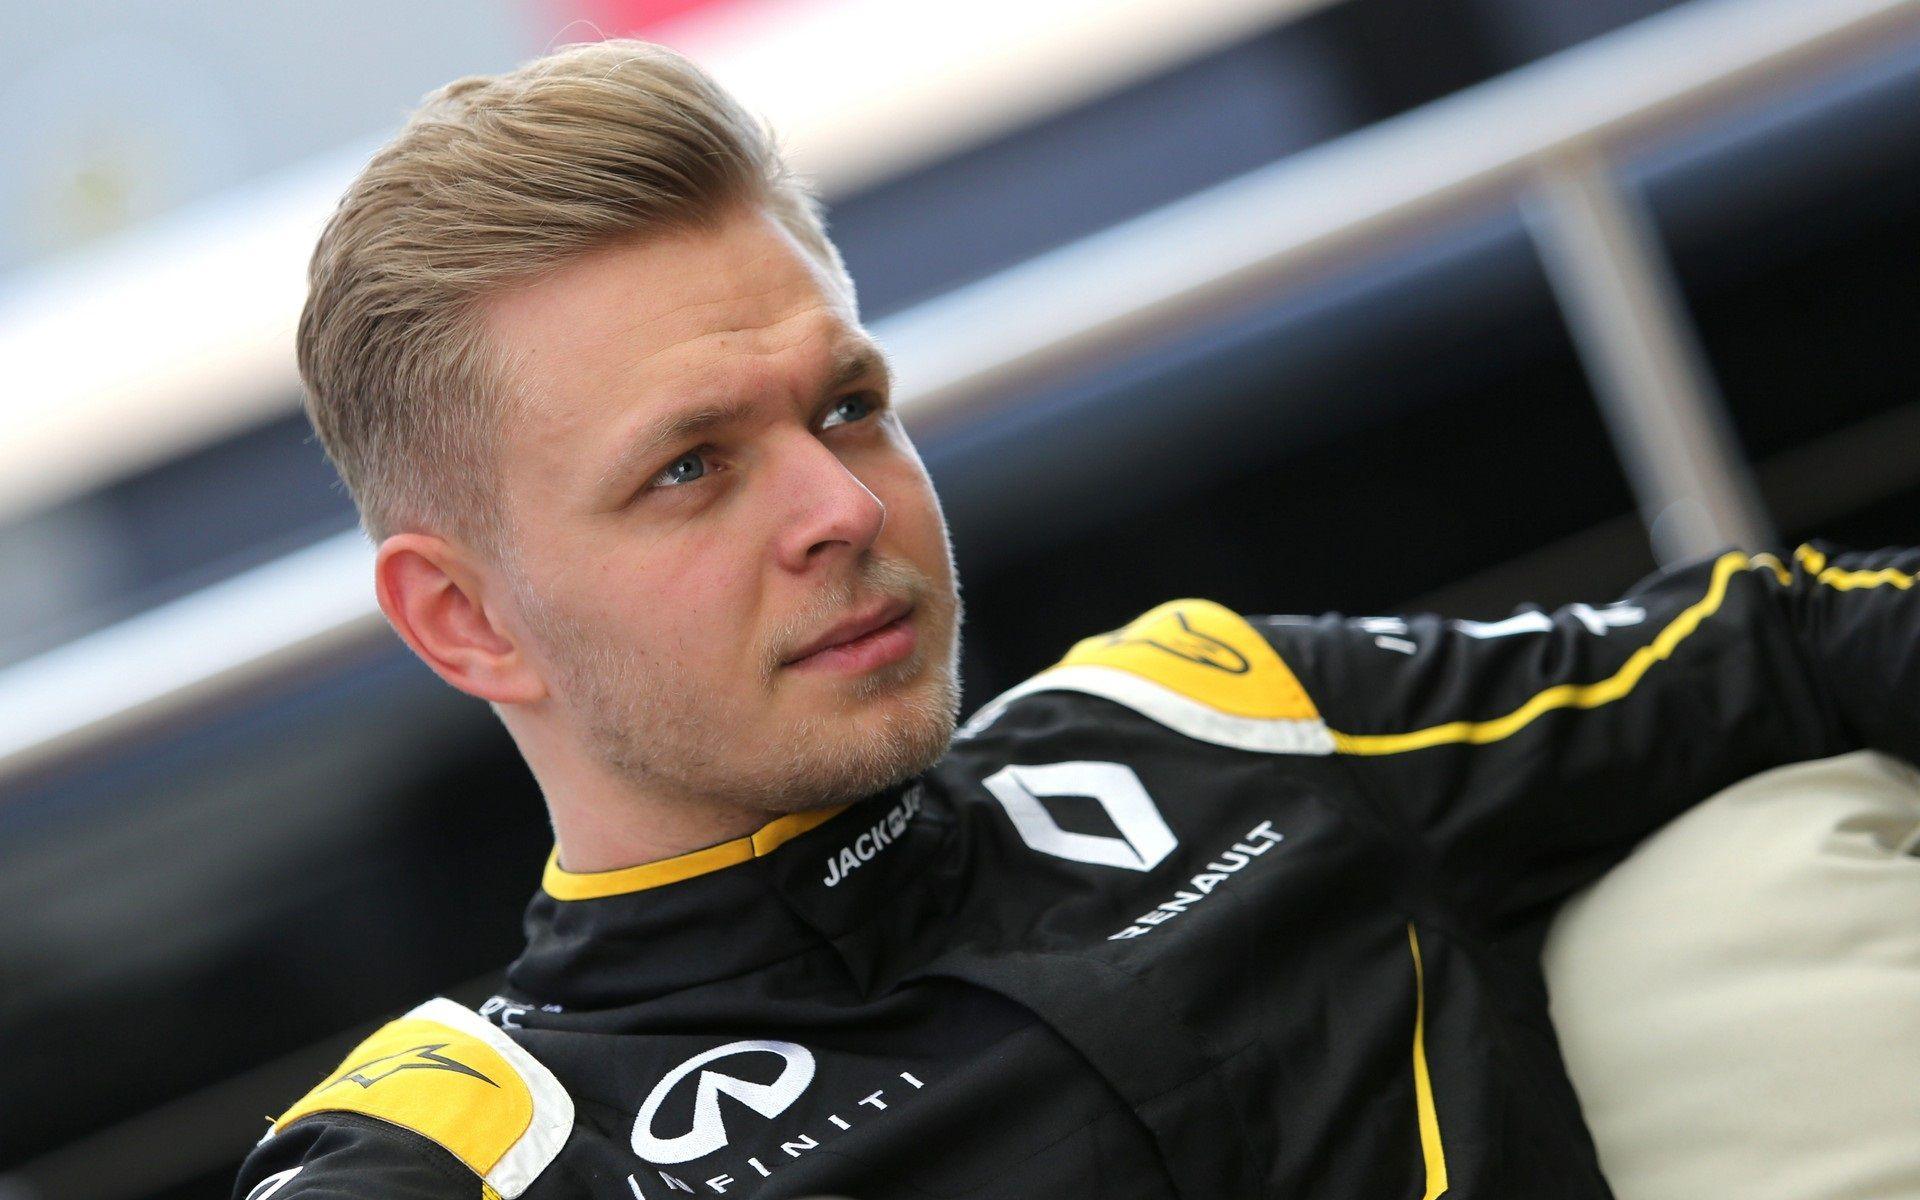 Kevin Magnussen, attualmente in Renault ma, dal 2017, in Haas (foto da: shiftinglanes.com / Charniaux / XPB Images)